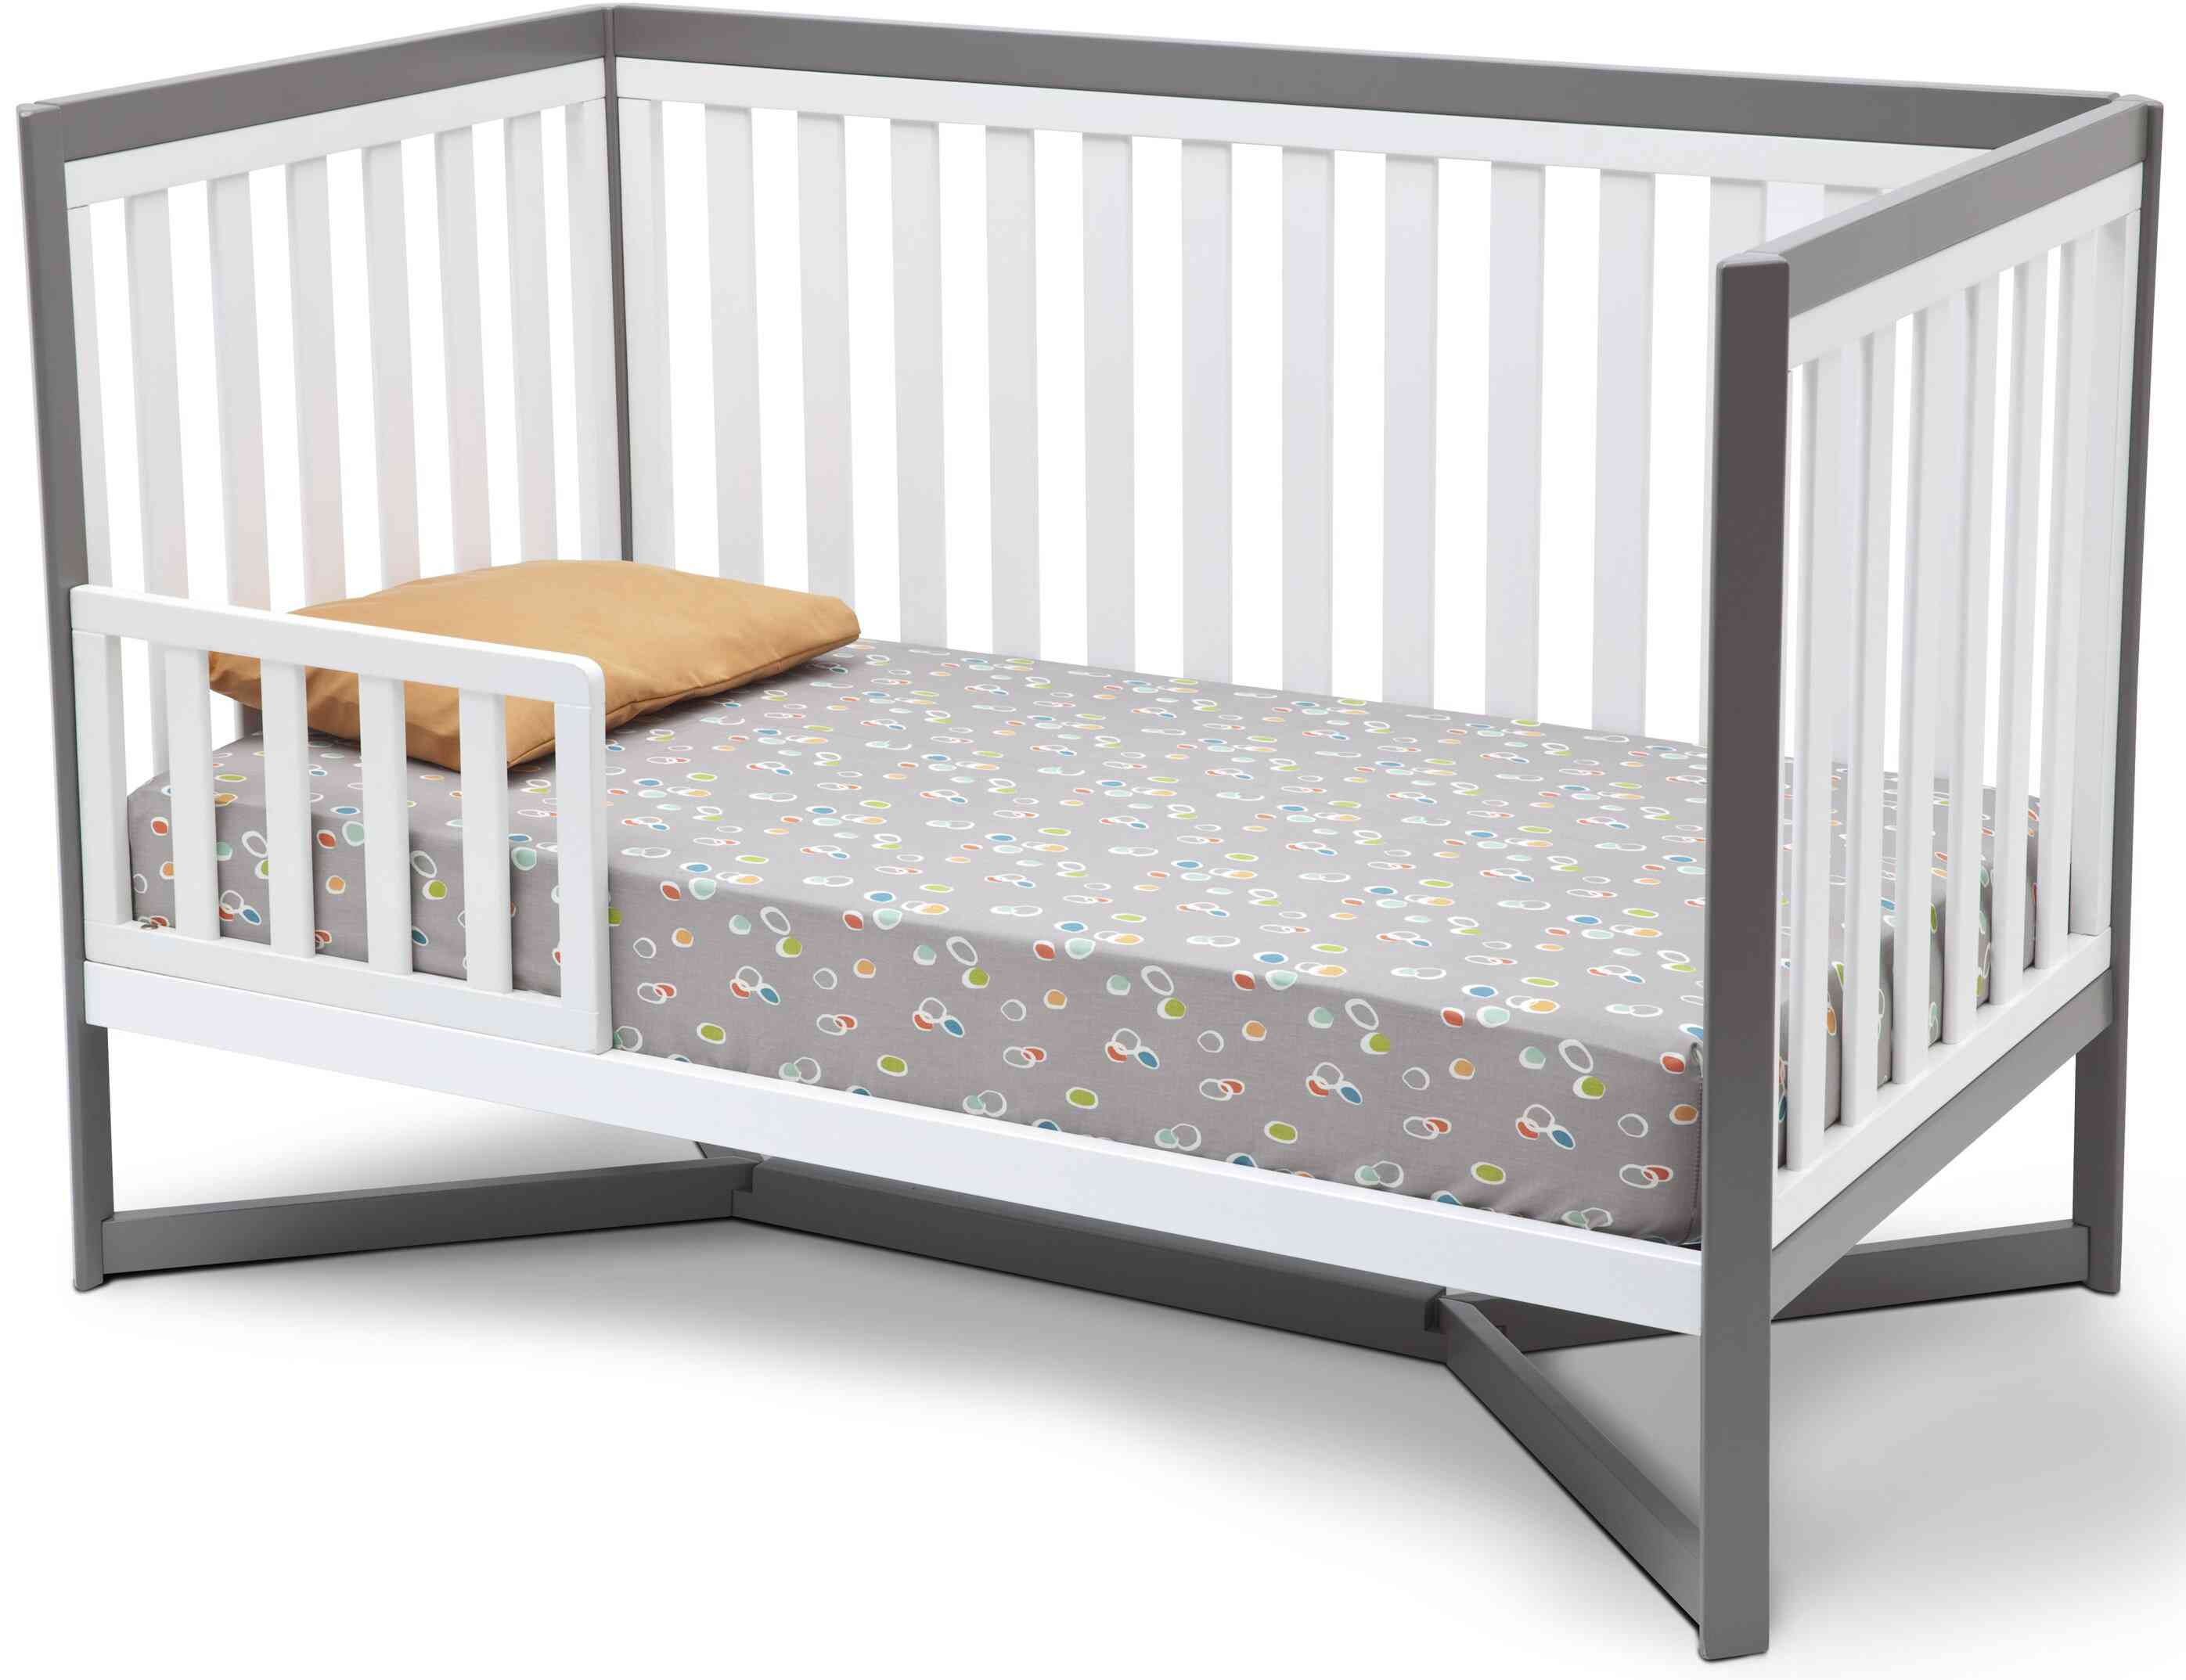 Tribeca 4-in-1 Convertible Crib